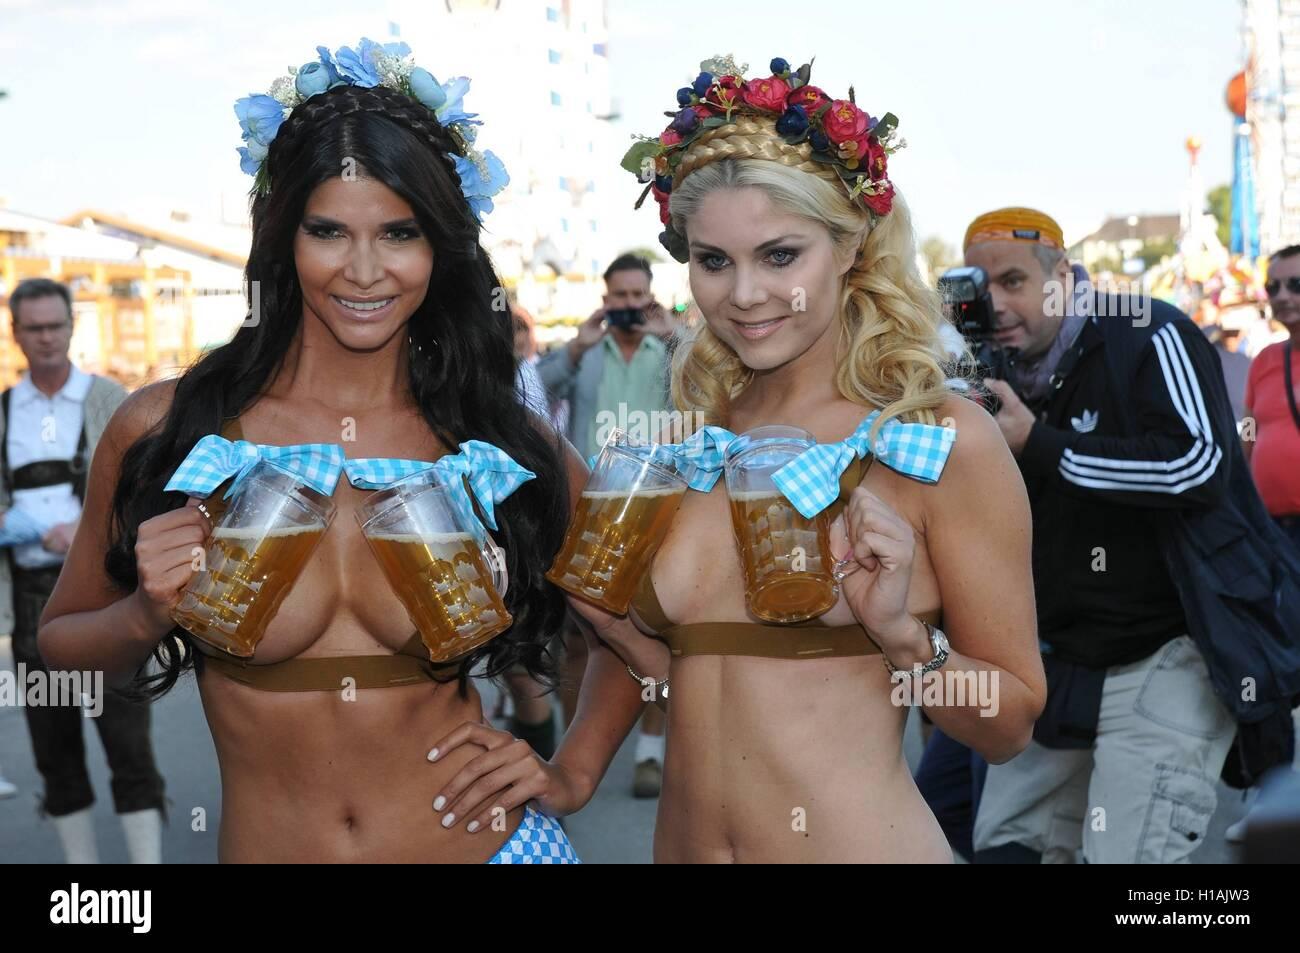 sarah joel und micaela nackt